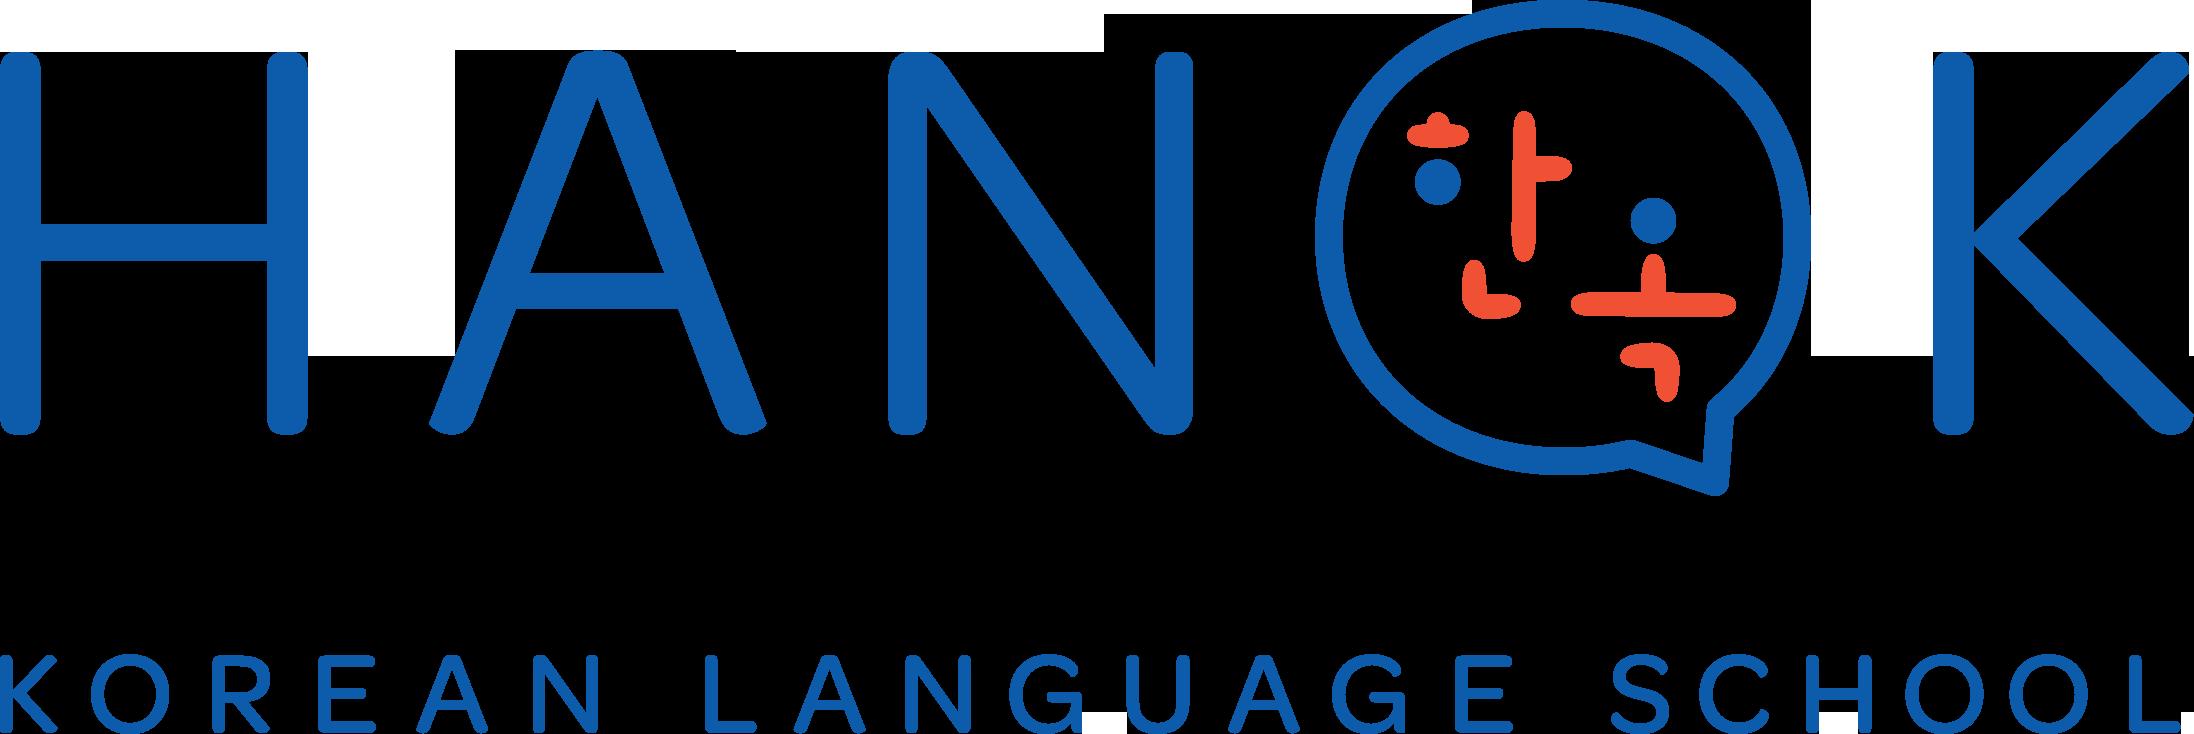 HANOK INTERMEDIATE 2 Qualification Test